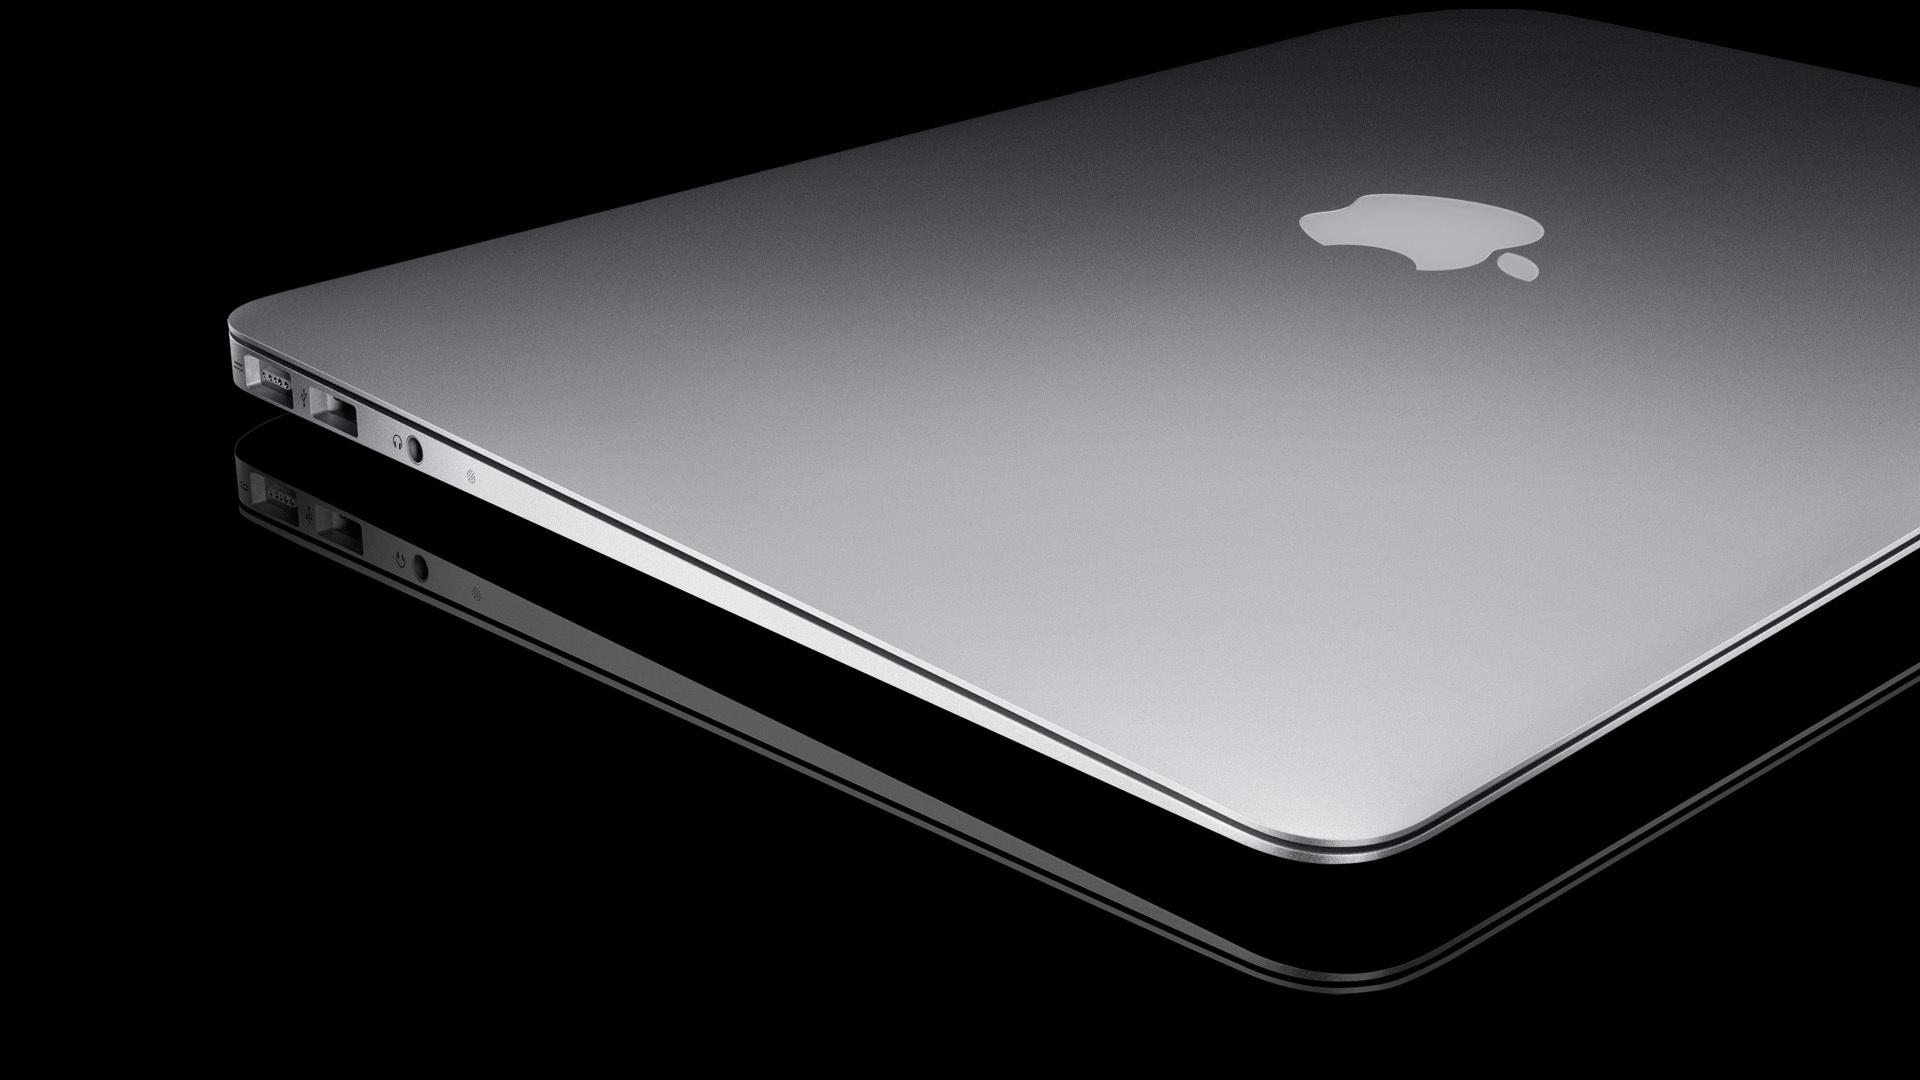 macbook air hd images 7 1920x1080